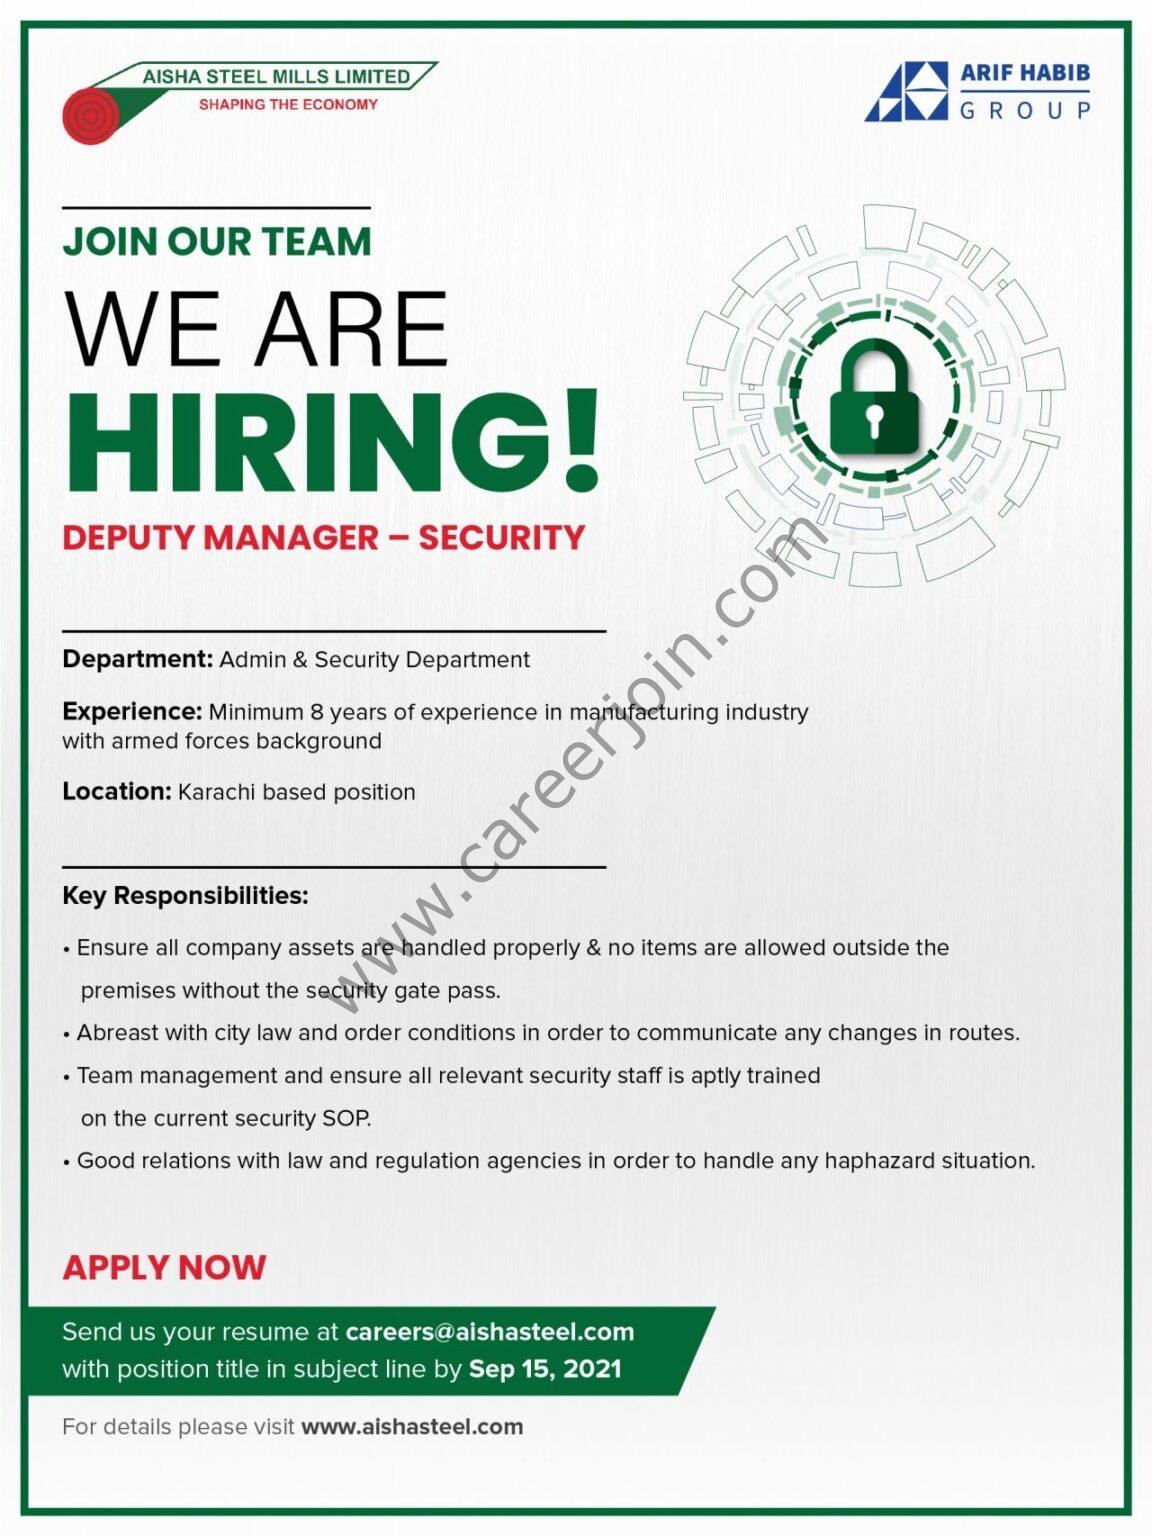 Aisha Steel Mills Ltd ASML Jobs Deputy Manager Security